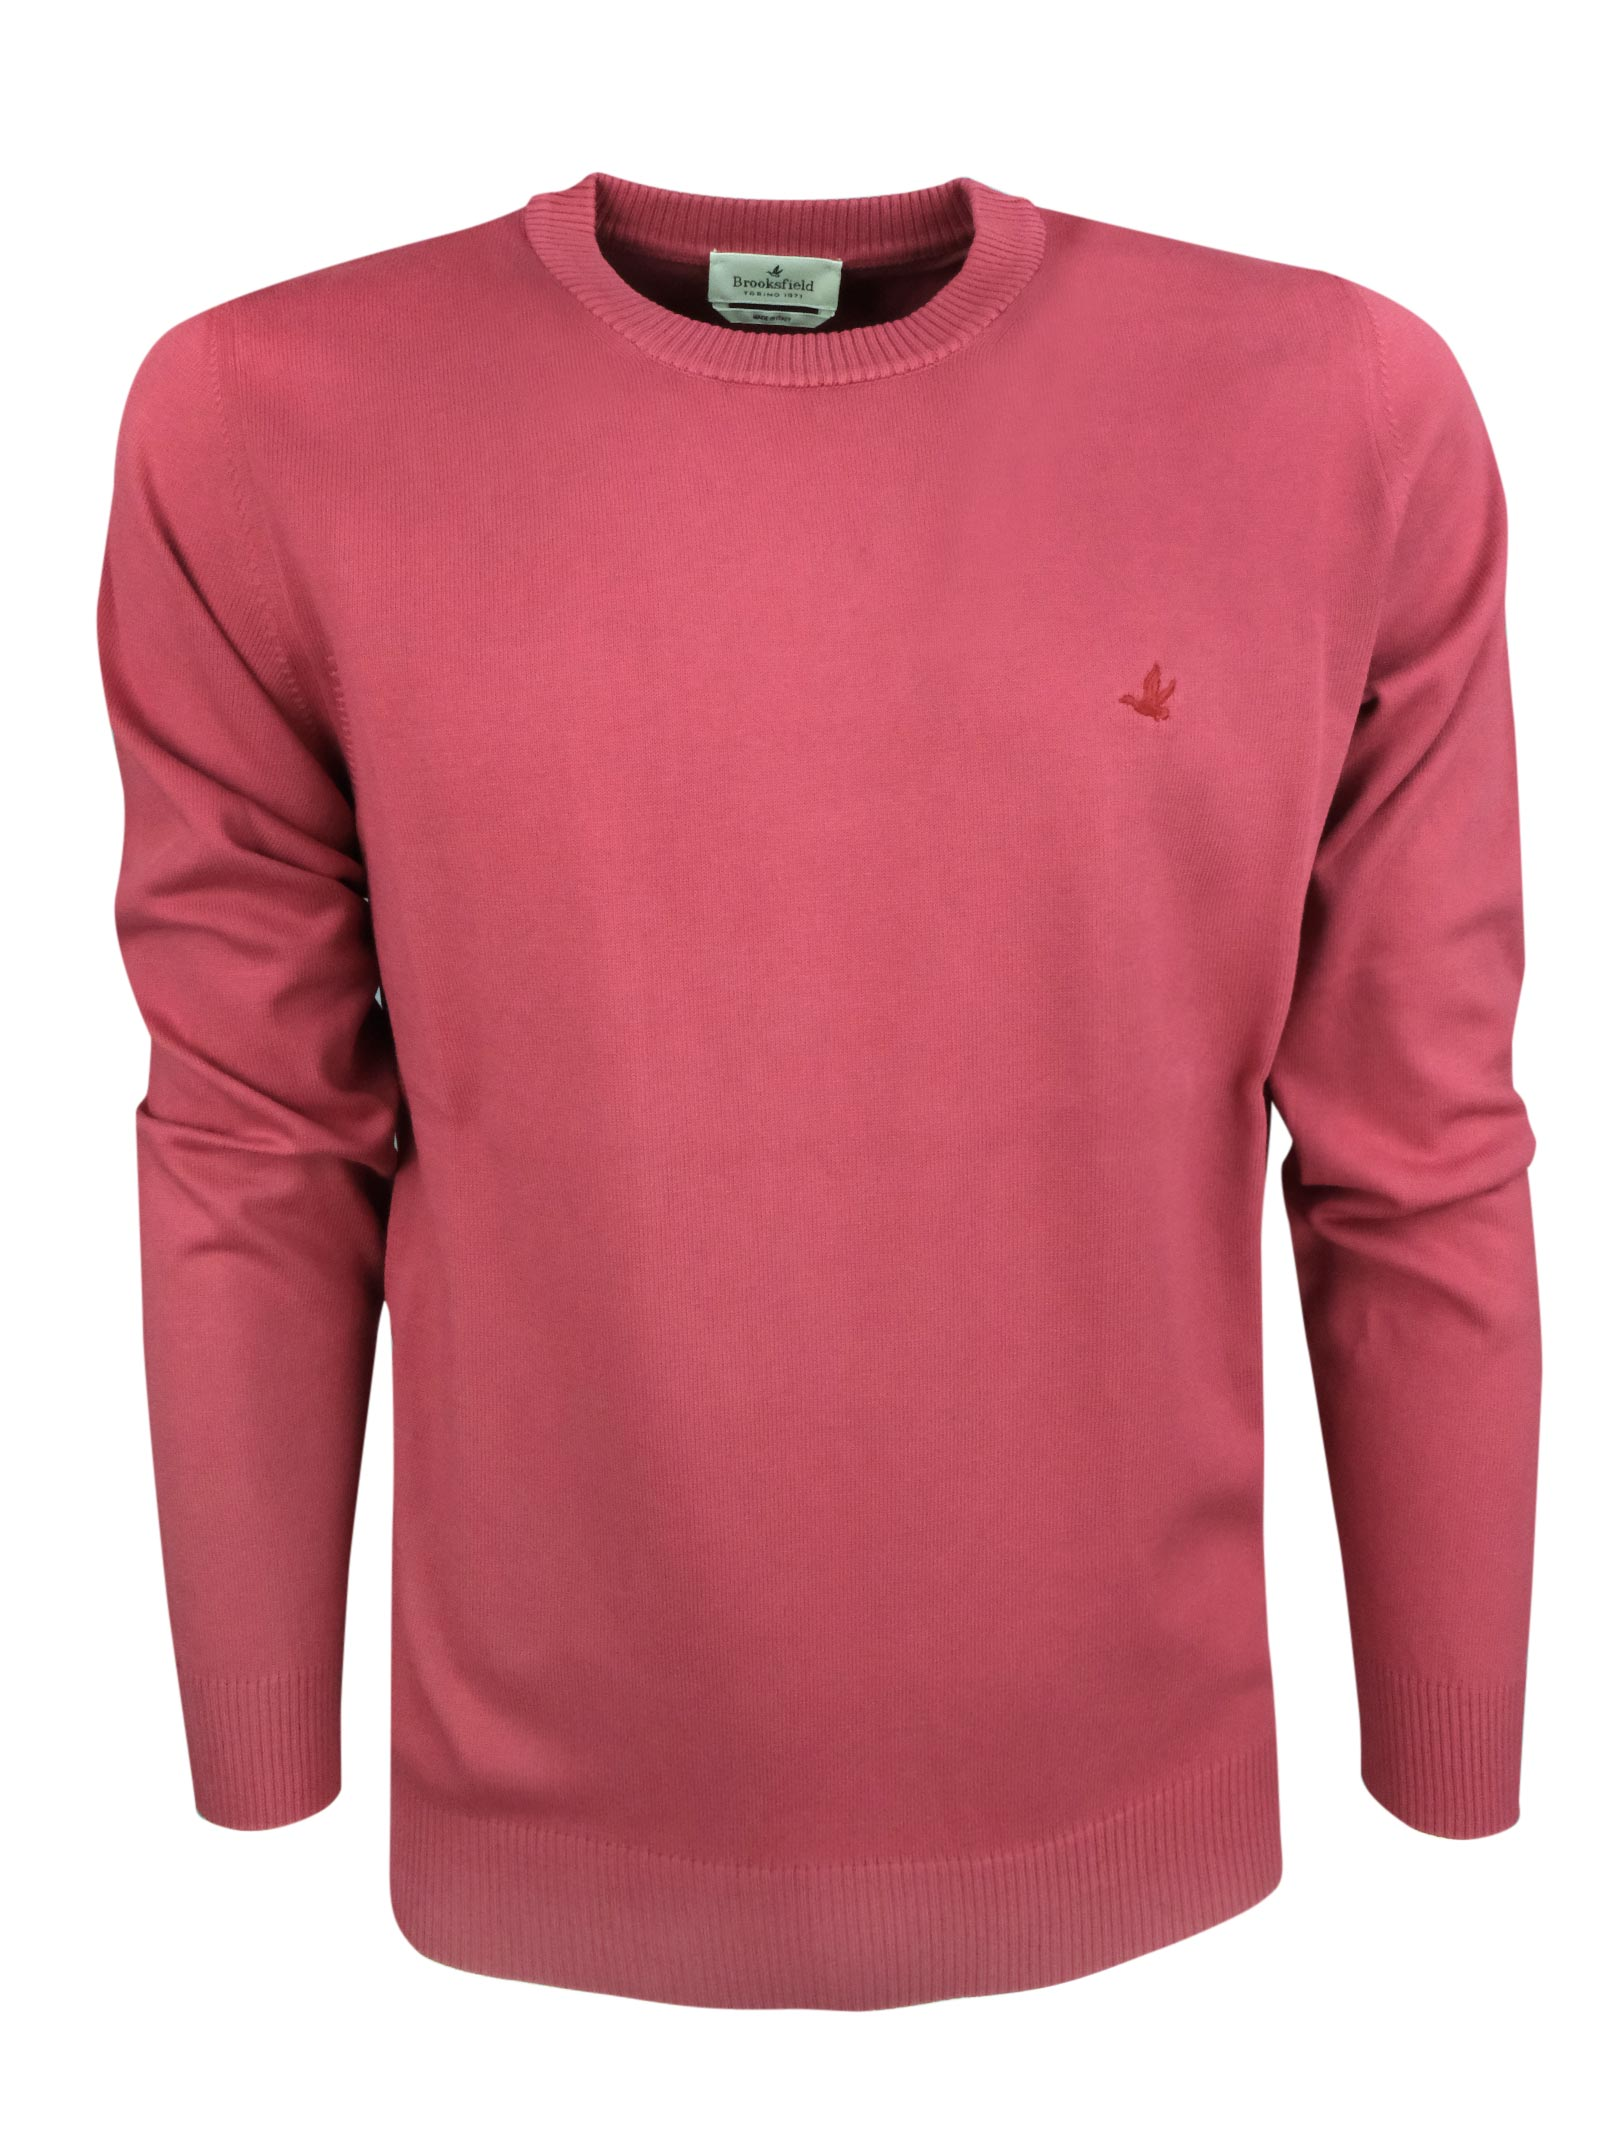 Crew neck cotton  sweater, contrast logo . BROOKSFIELD   Knitwear   203E.A0217242